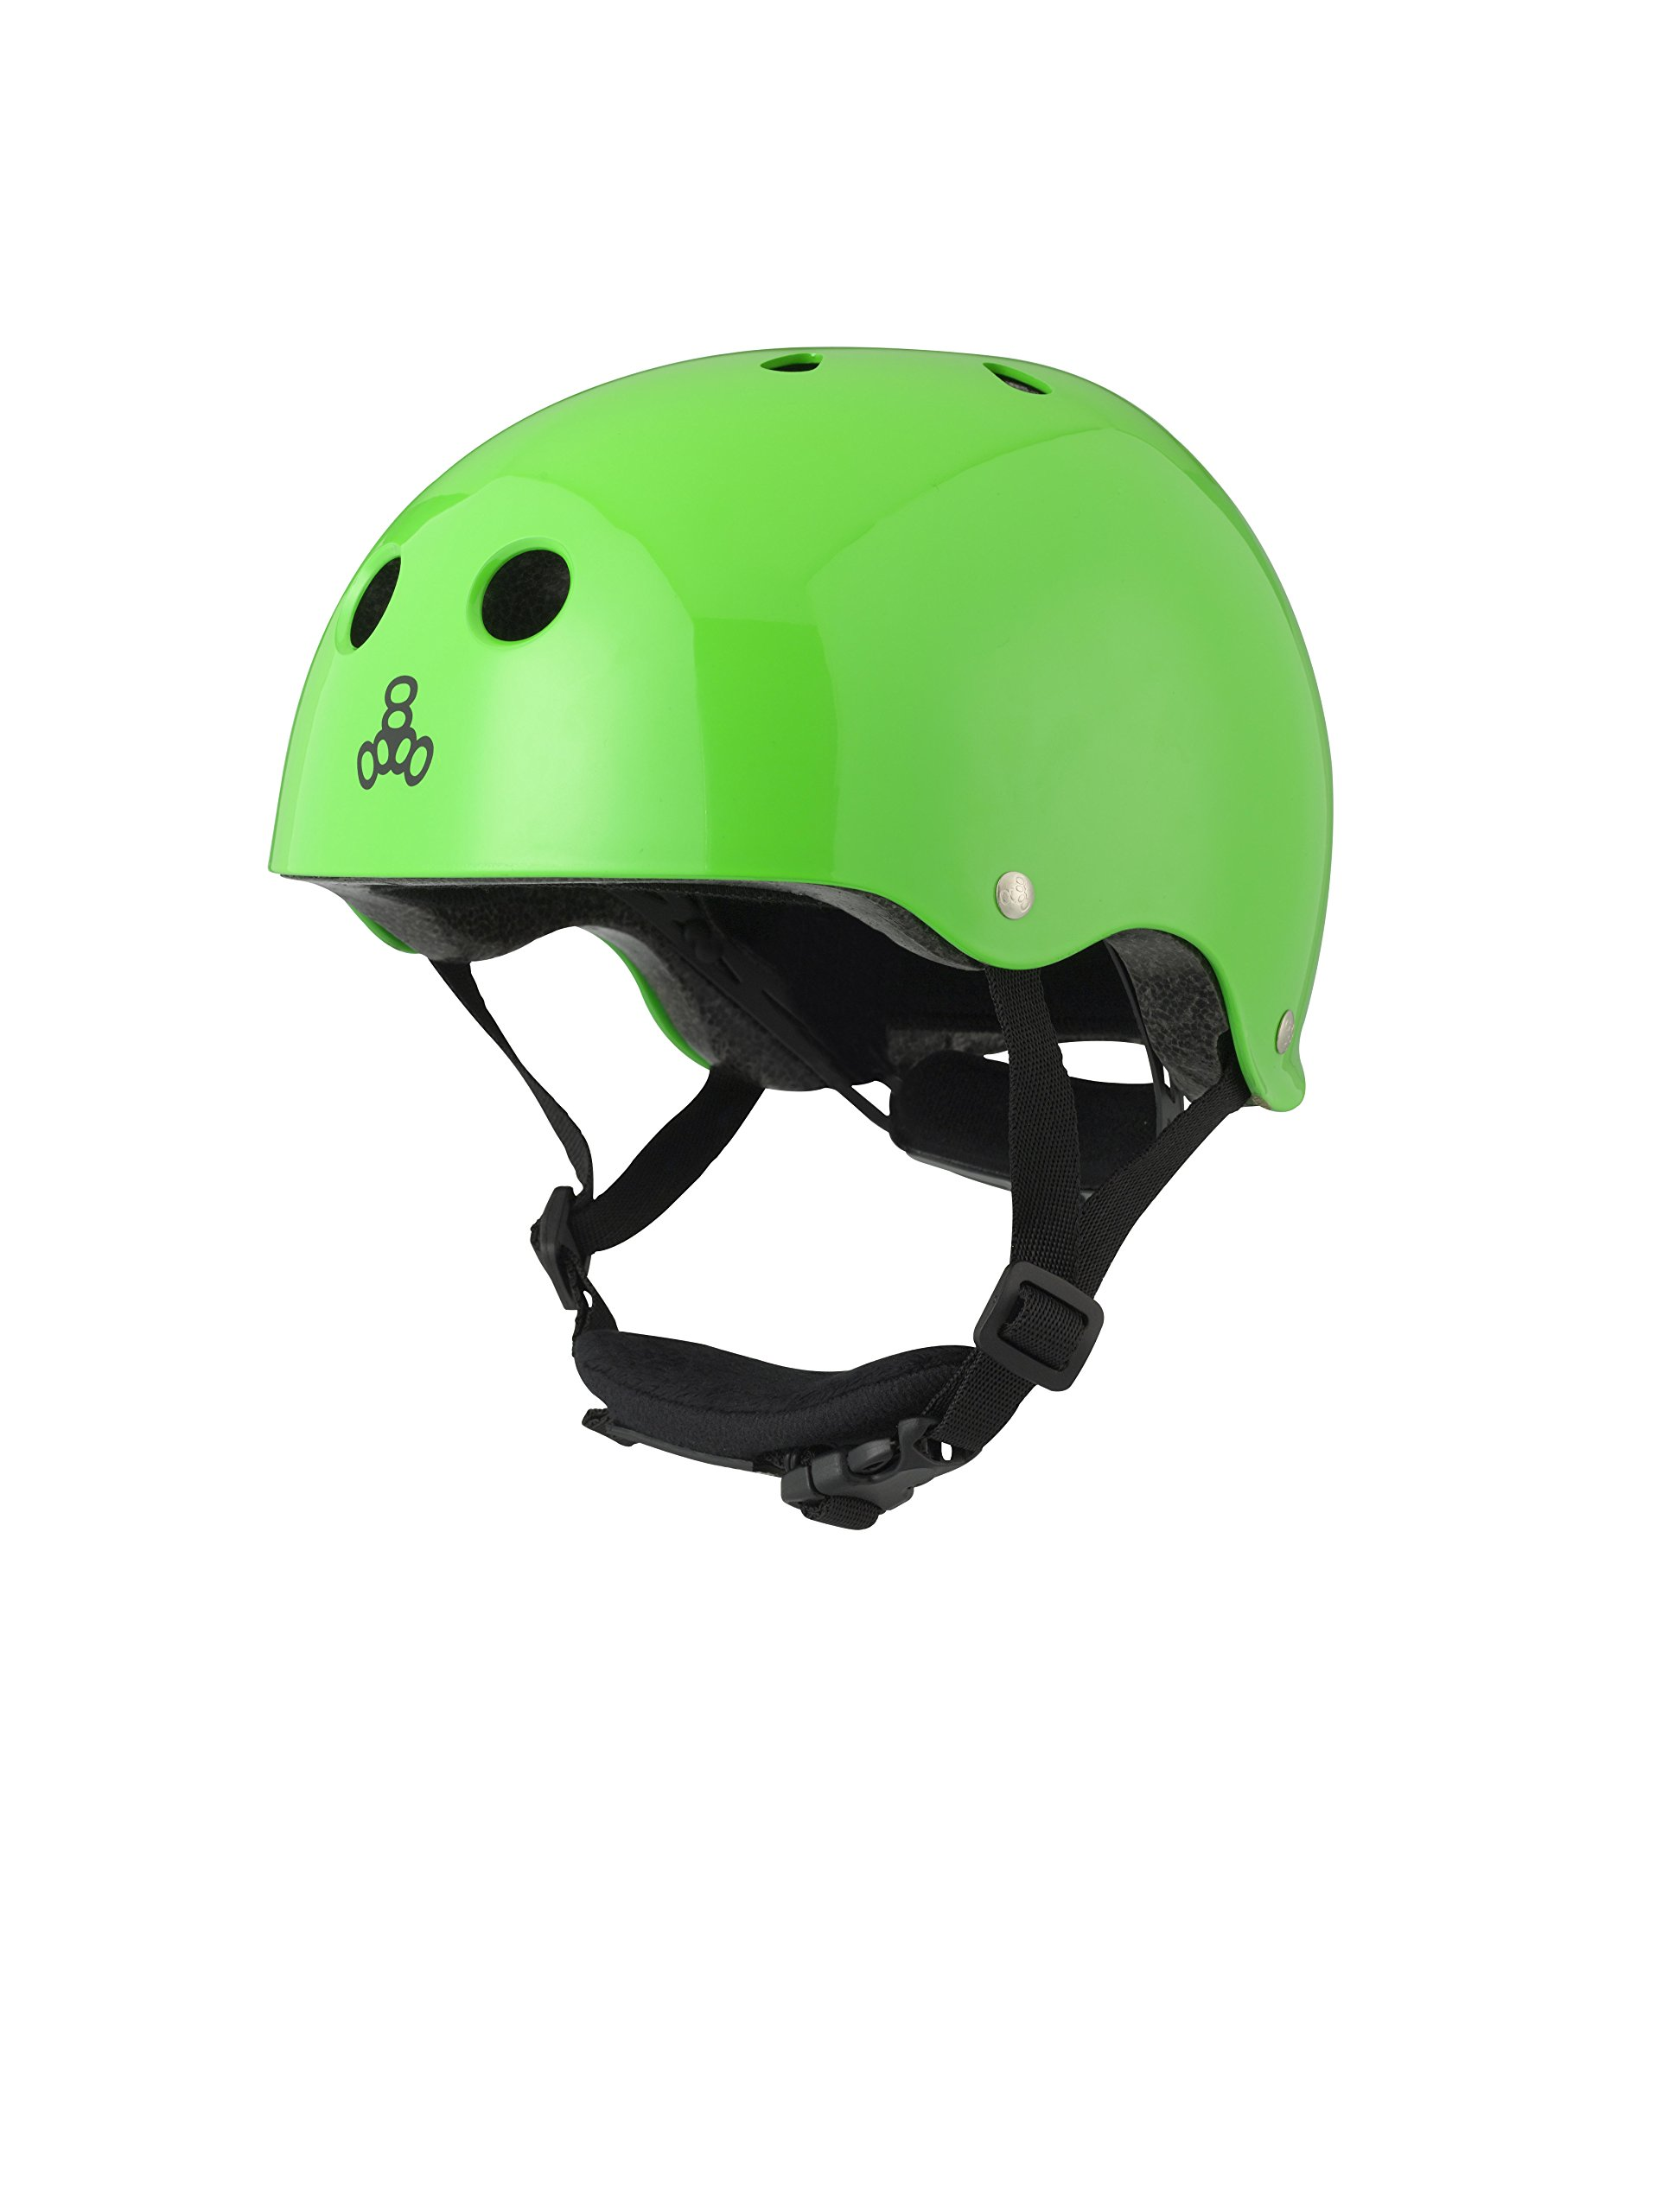 Triple Eight Lil 8 Dual Certified Sweatsaver Kids Skateboard and Bike Helmet with Padded Chin Buckle, Neon Green Glossy